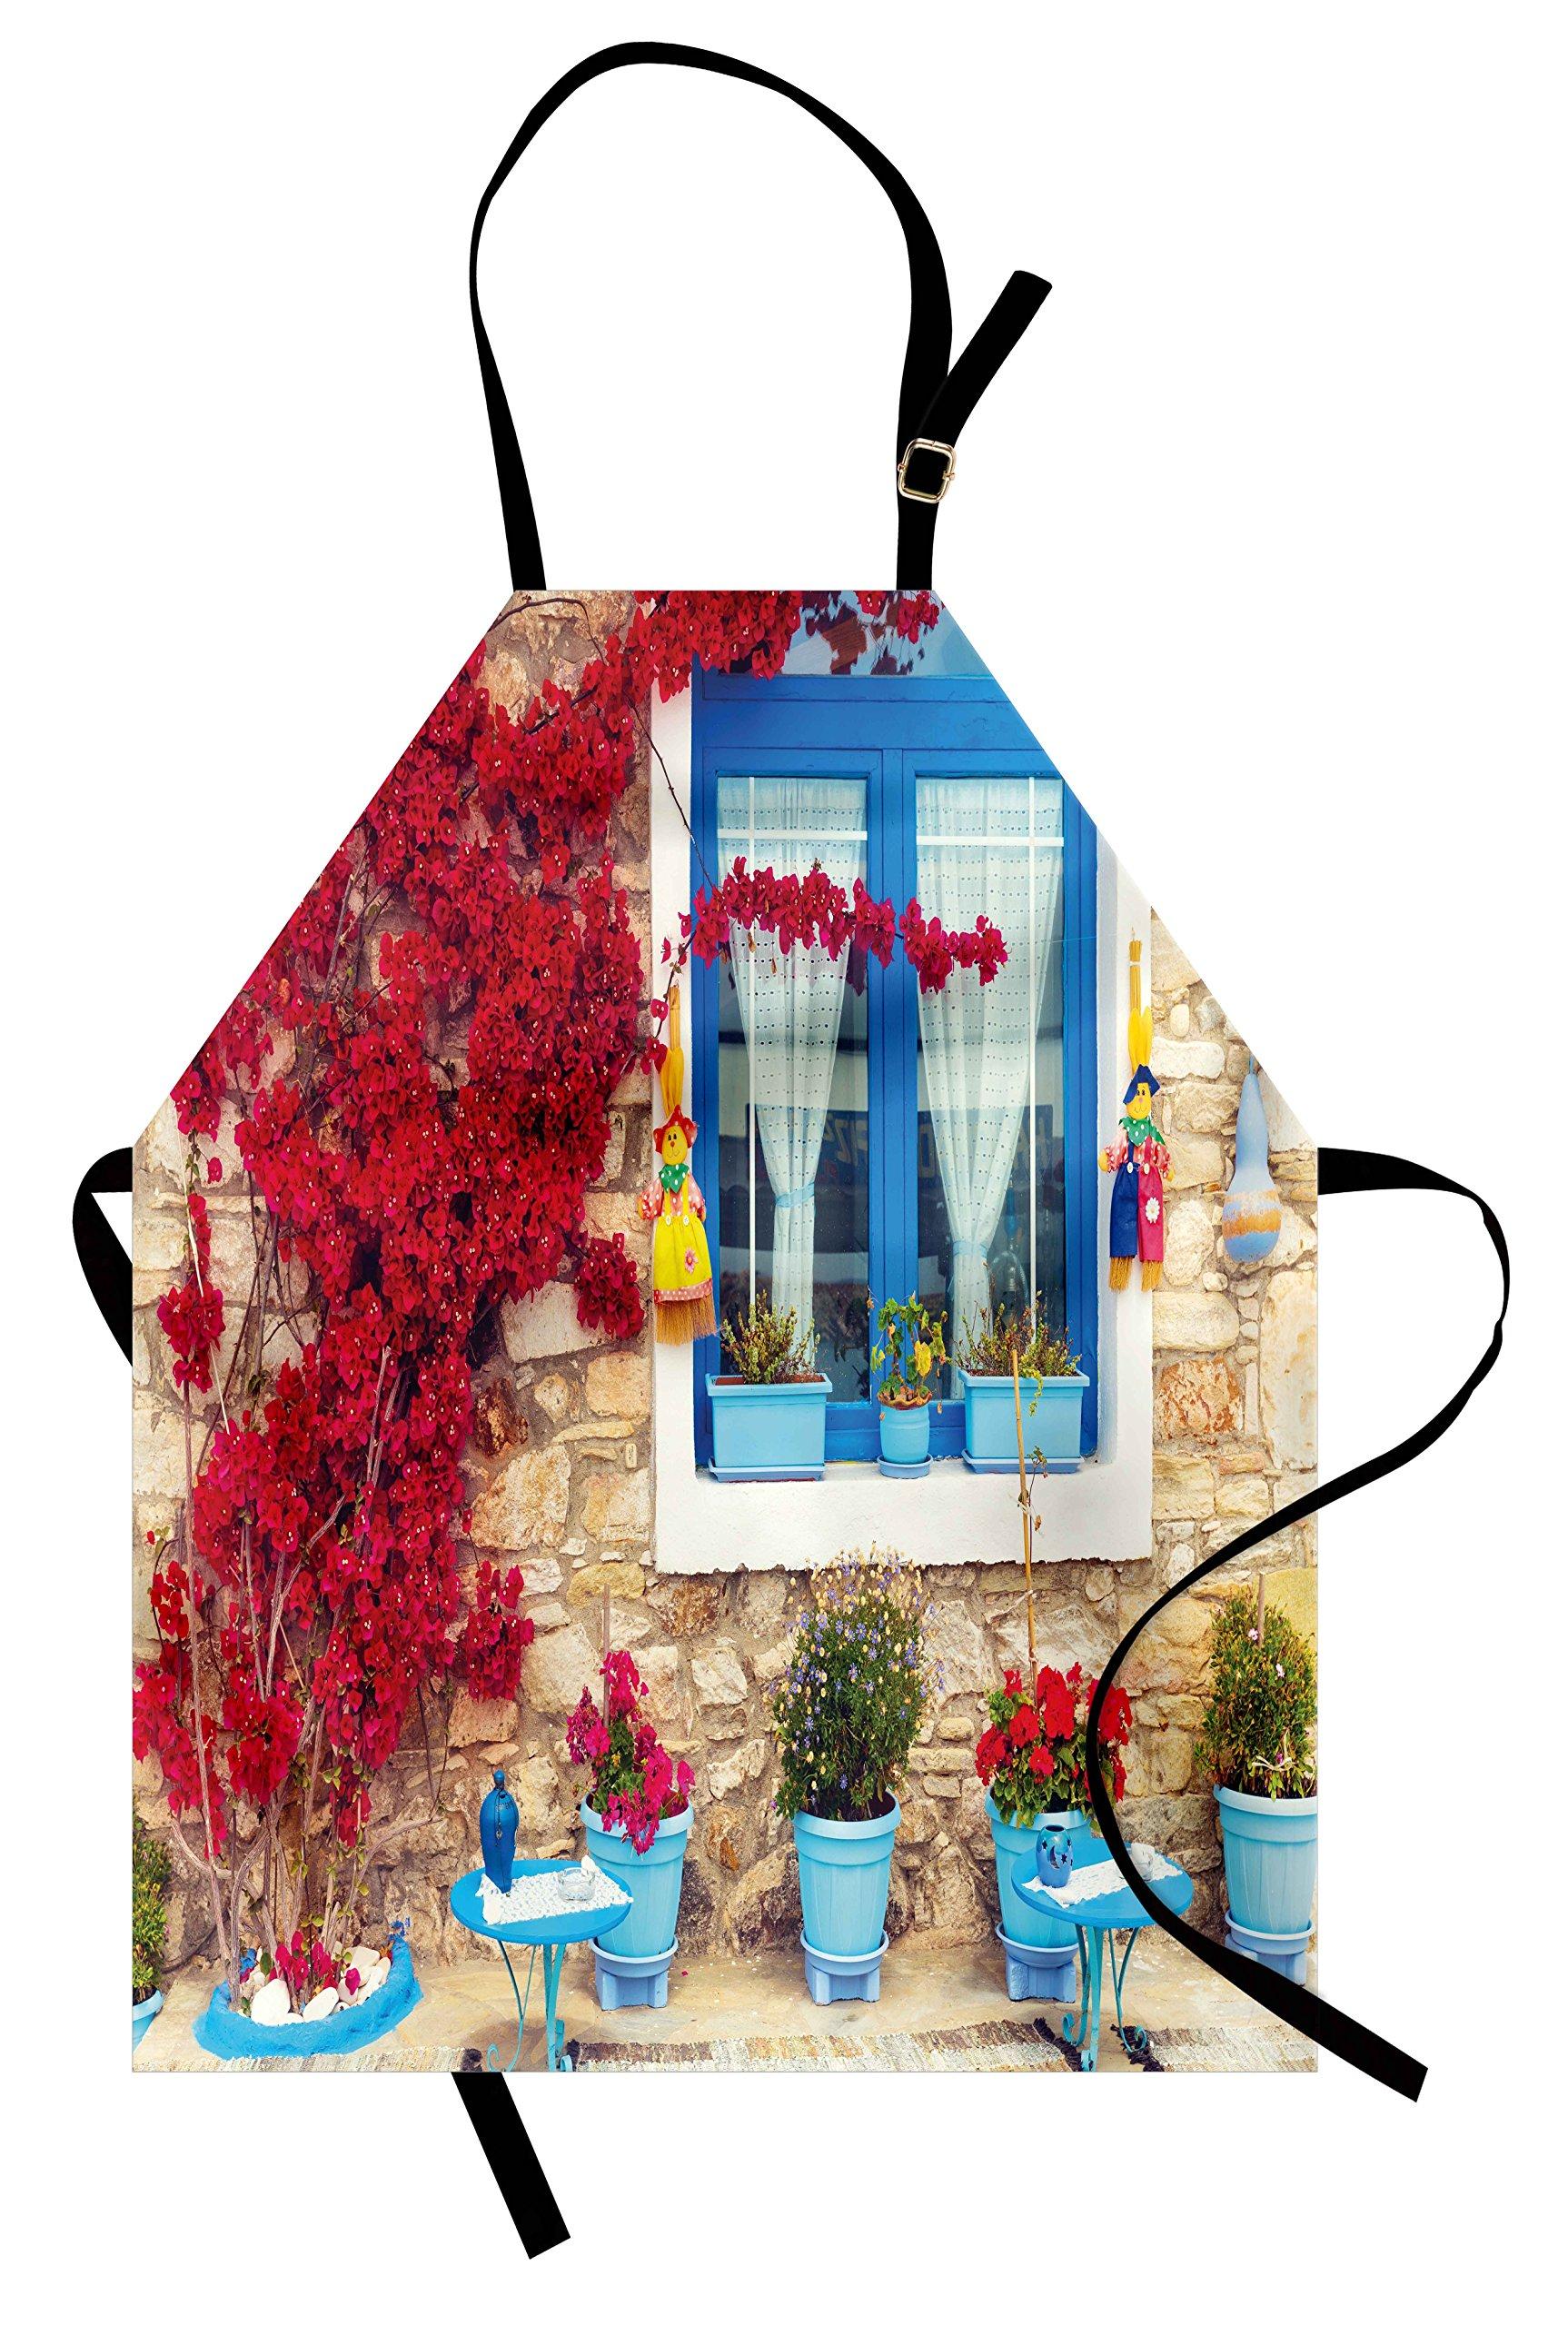 Ambesonne Coastal Apron, Italian Design Mediterranean House with Greek Windows Print, Unisex Kitchen Bib Apron with Adjustable Neck for Cooking Baking Gardening, Pale Brown White and Navy Blue